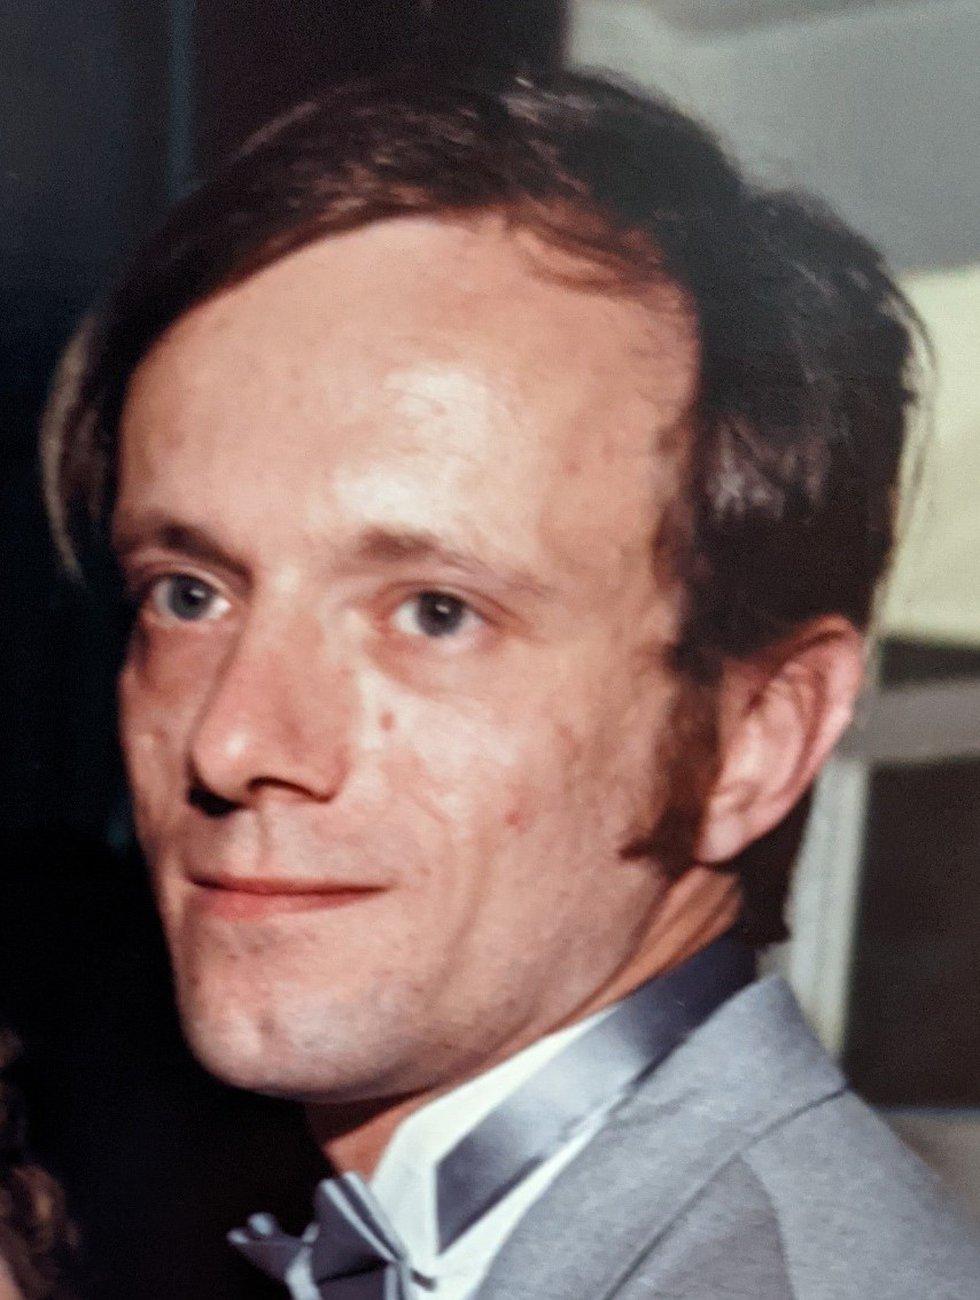 Raymond A. (Joe) Kilbourn,68, of 11 Liberty St., West Carthage died Sunday evening, May 9, 2021...